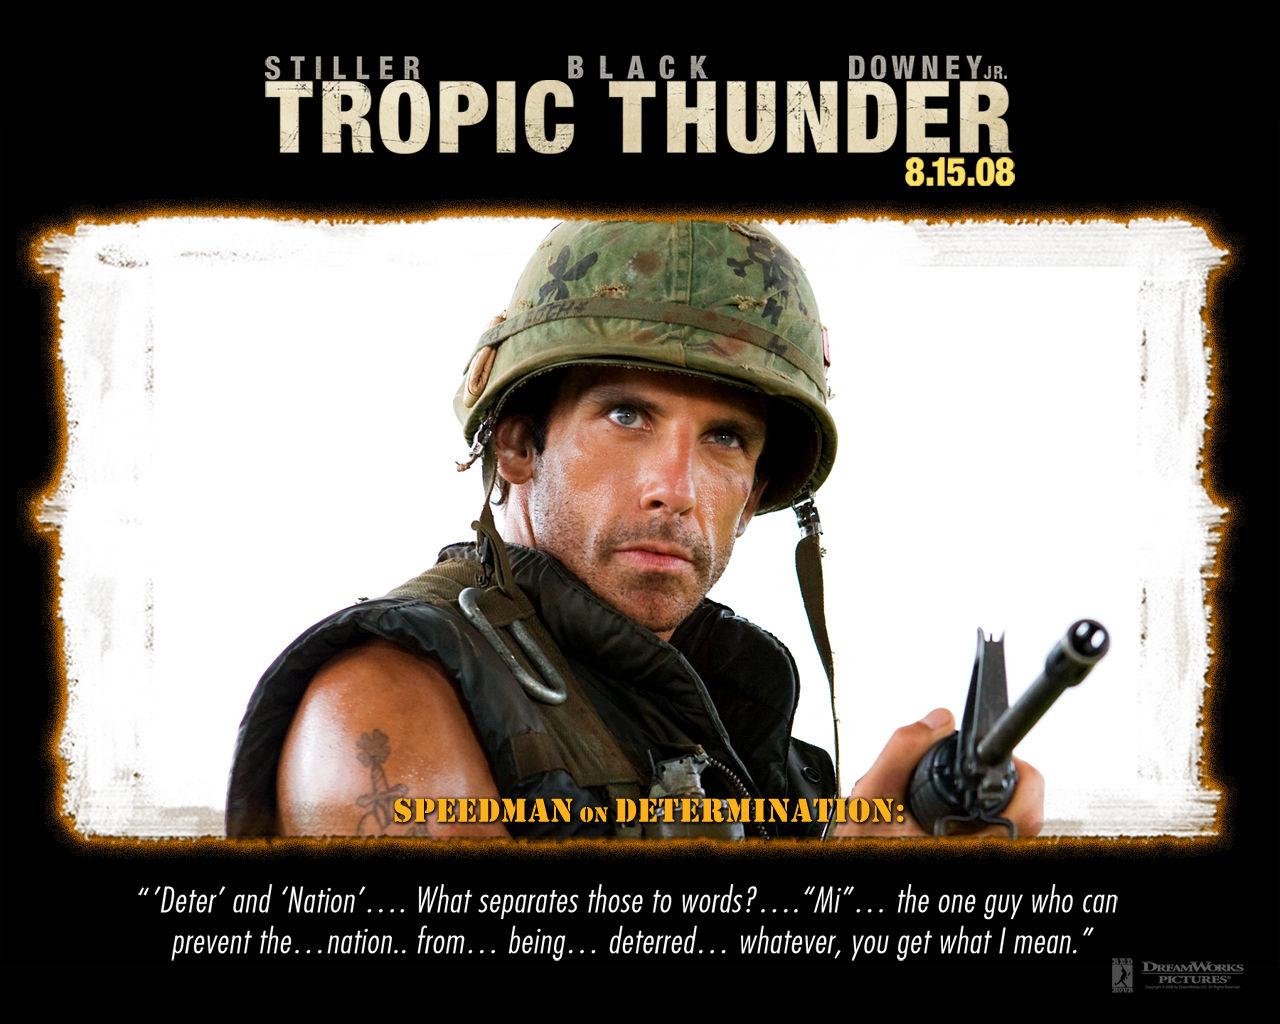 http://3.bp.blogspot.com/_R5WS6_kmmTI/TAEjGefG6fI/AAAAAAAAvQ0/_flRQVPsuP0/s1600/tropic_thunder15+(1).jpg